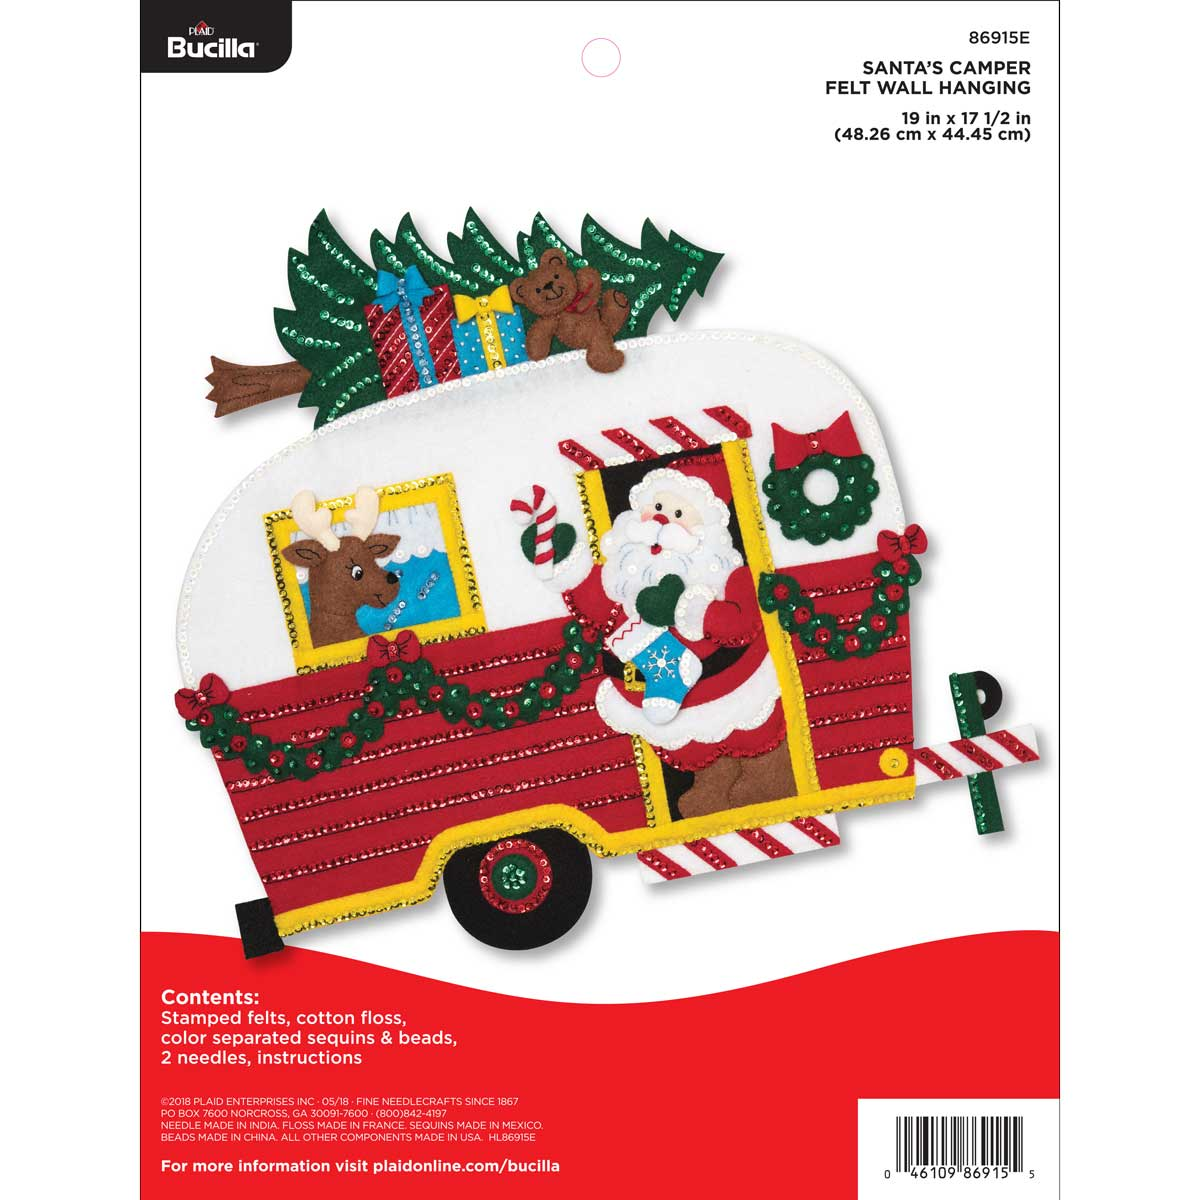 Bucilla ® Seasonal - Felt - Home Decor - Santa's Camper Wall Hanging